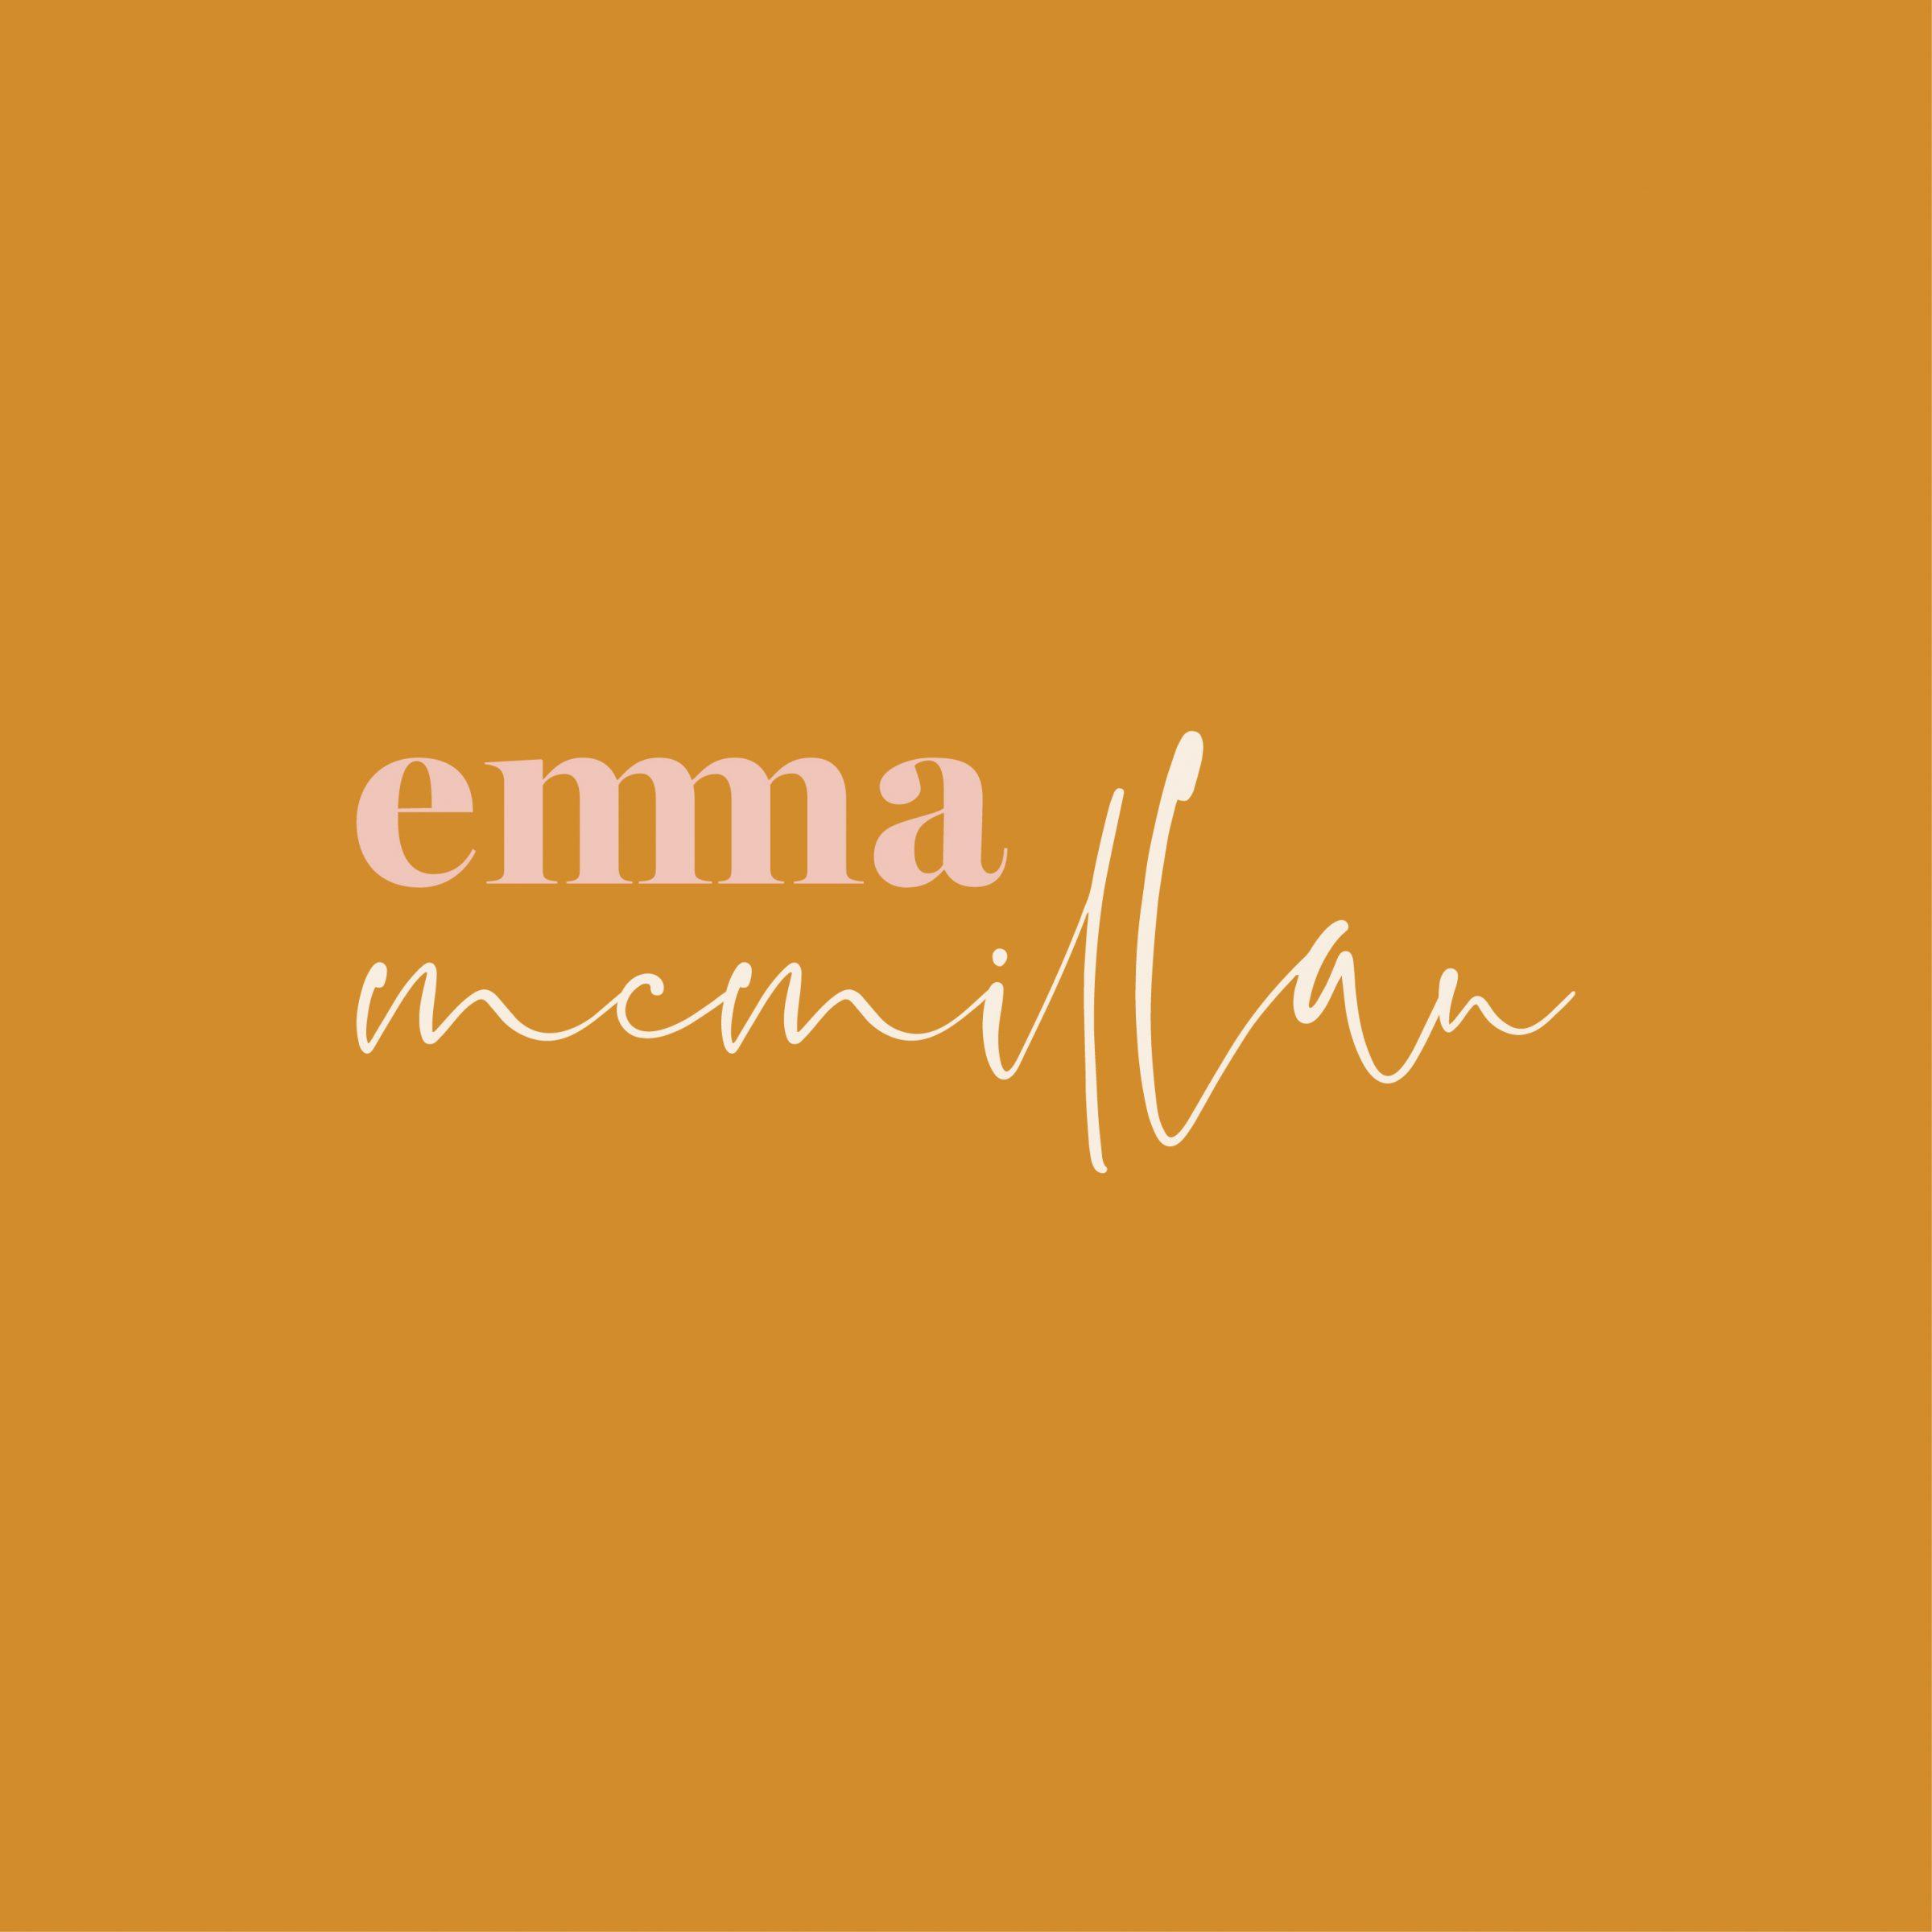 BRANDING LOGO EMMA MCMILLAN